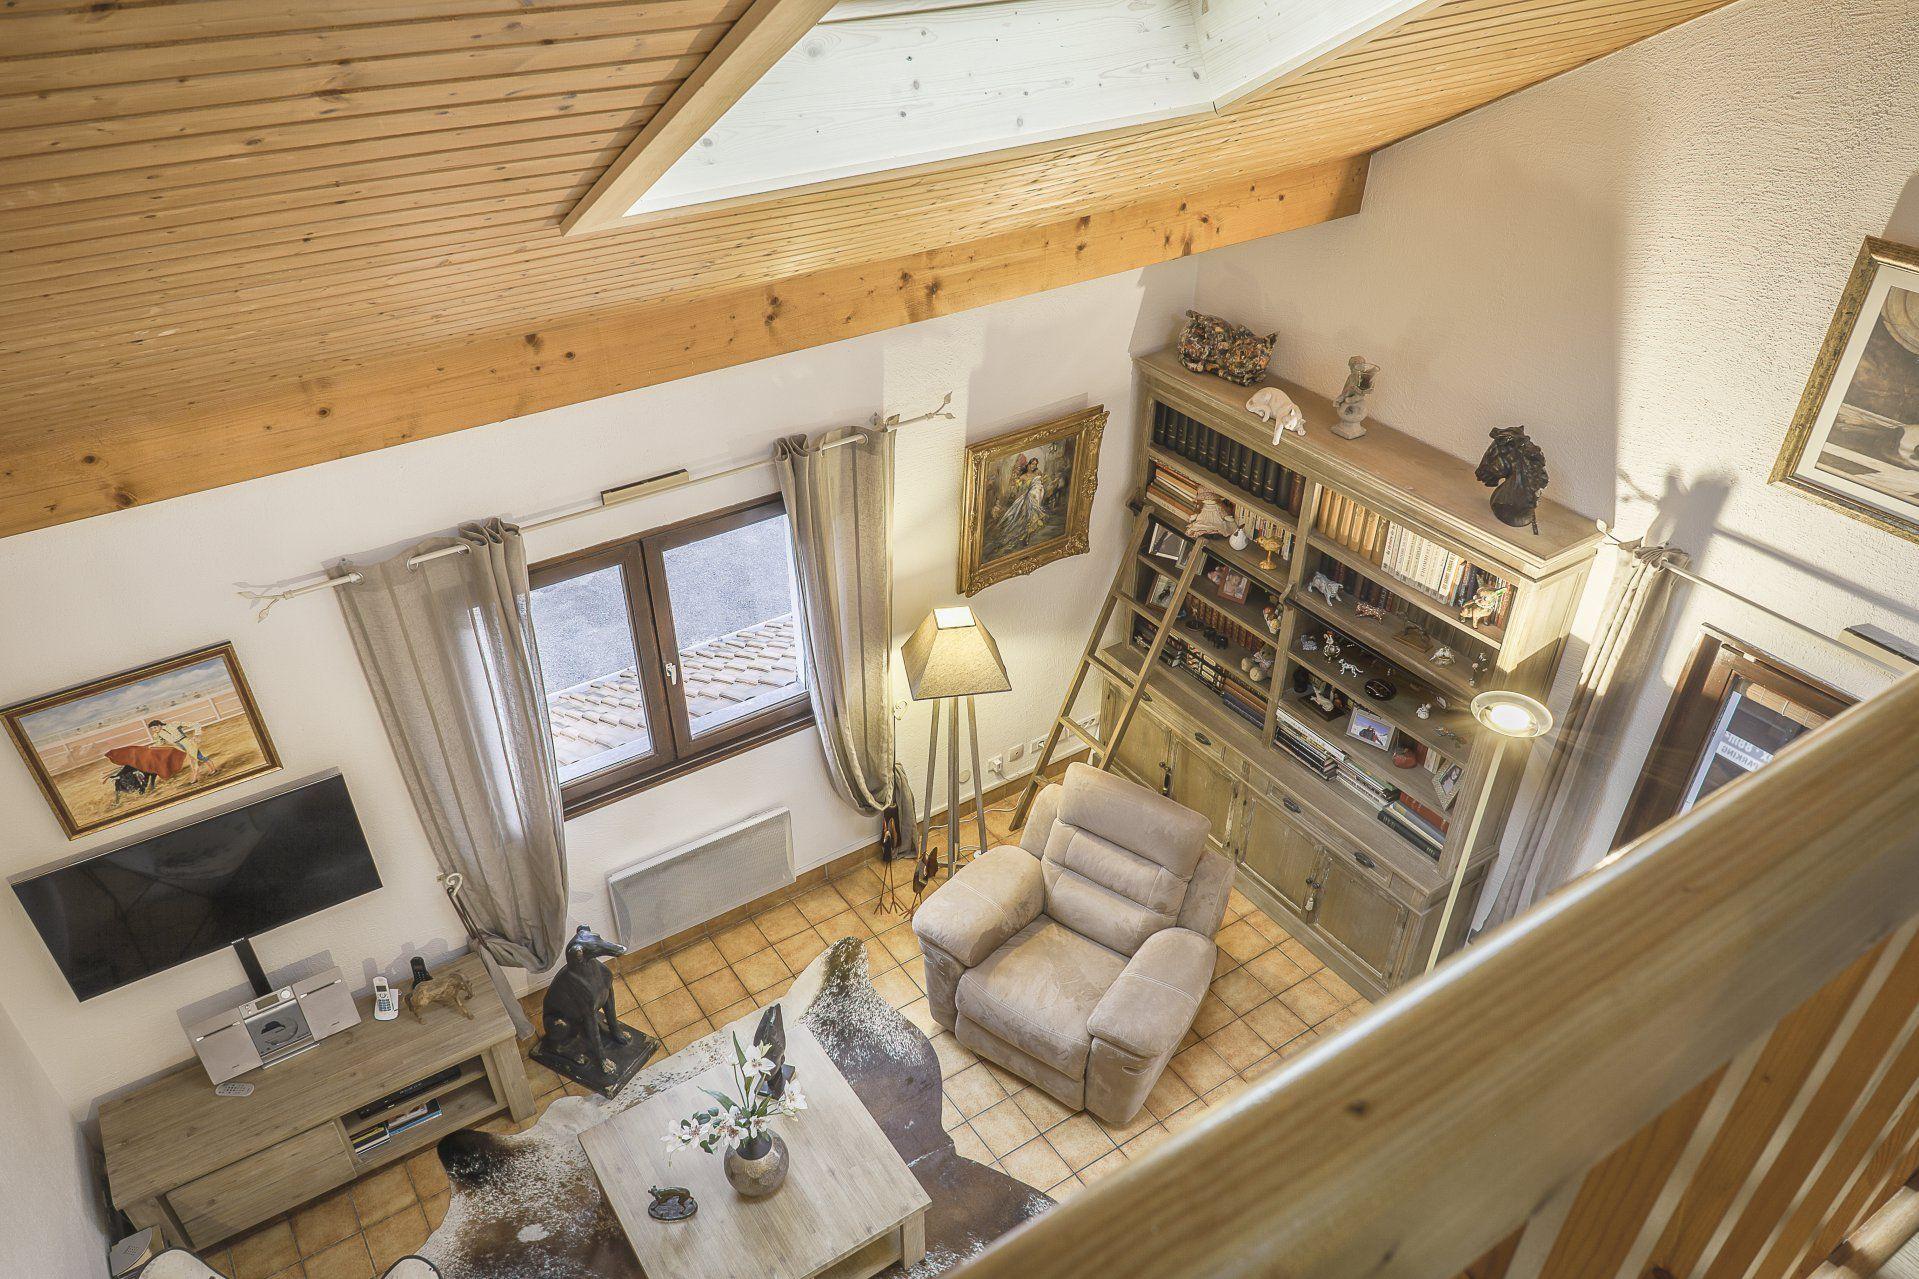 Exclusive - Publier - Duplex apartment of 88 sq. m - 2 Bedrooms